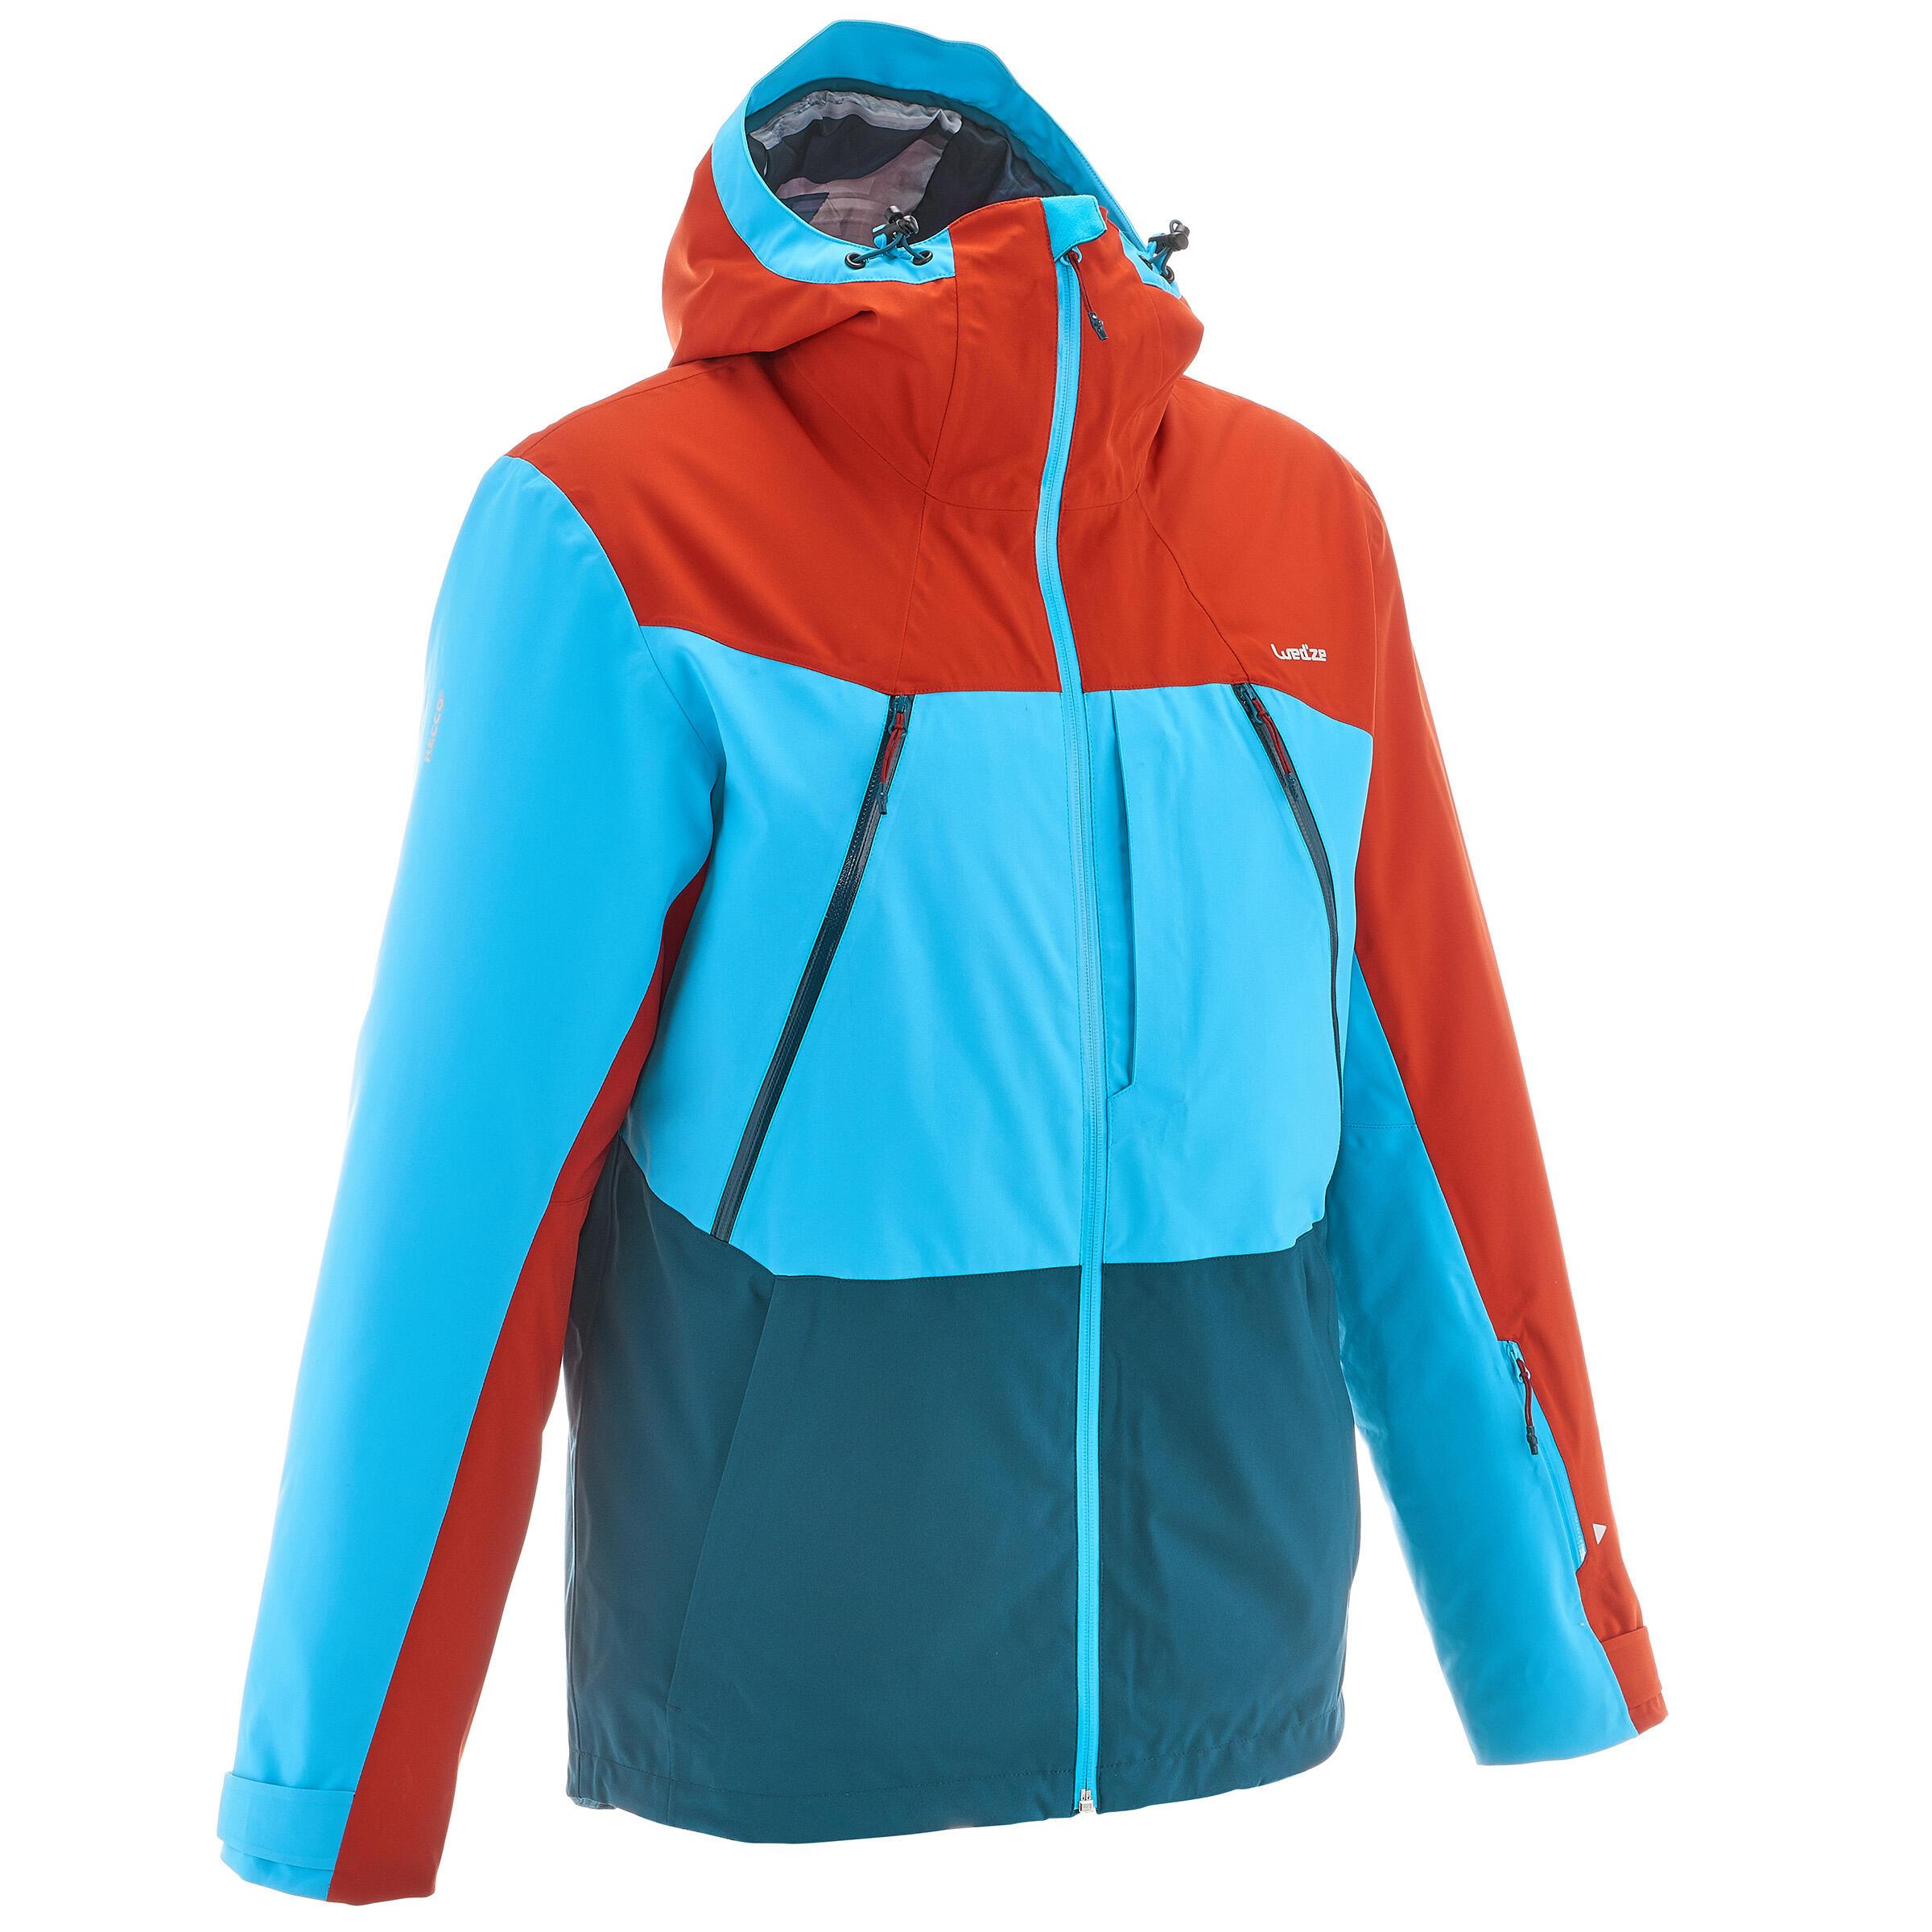 Herren Skijacke Freeride 700 Herren rot blau | 03608449883399